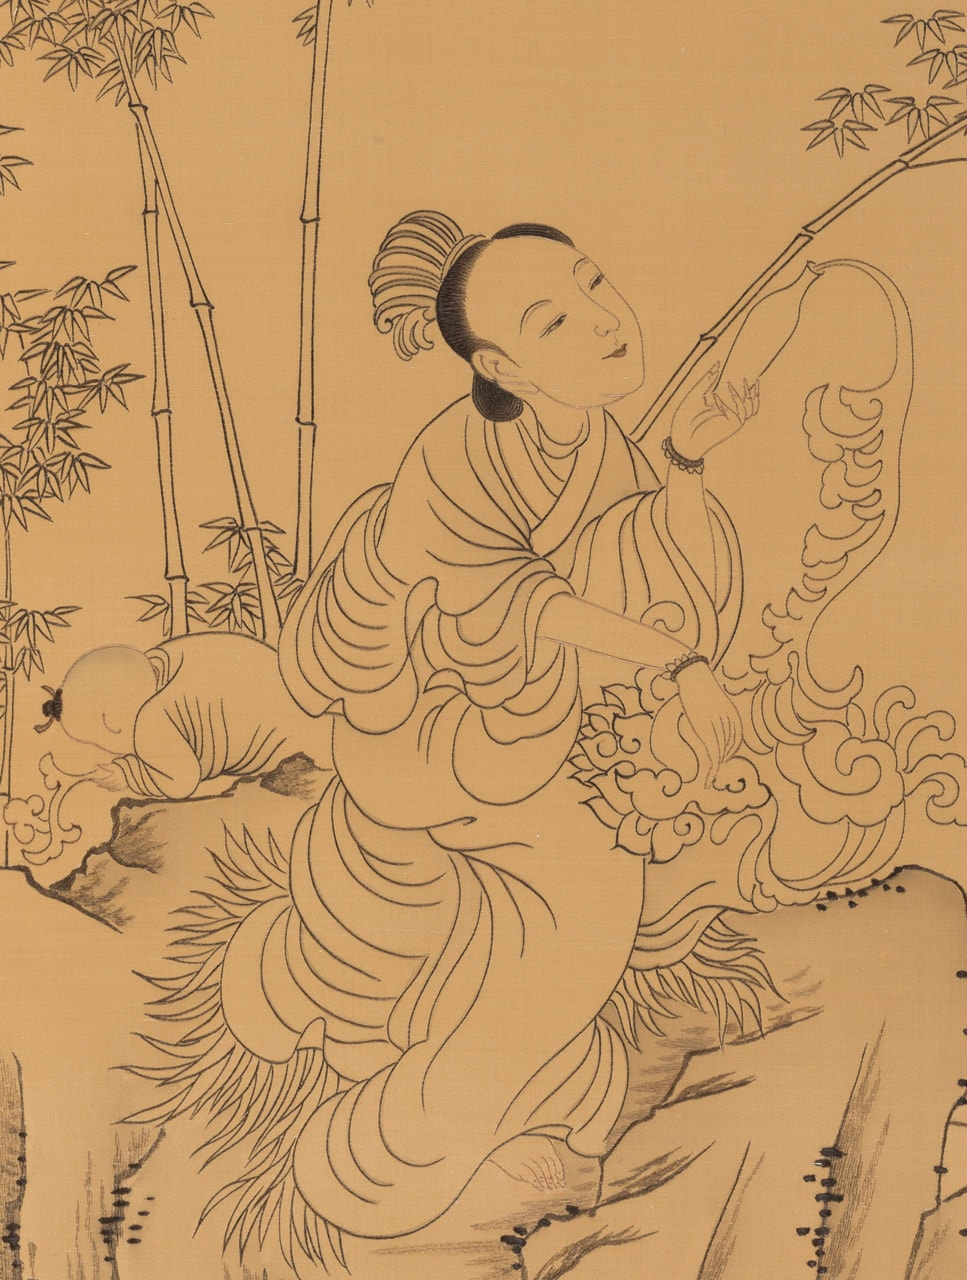 Offering Nectar (detail)